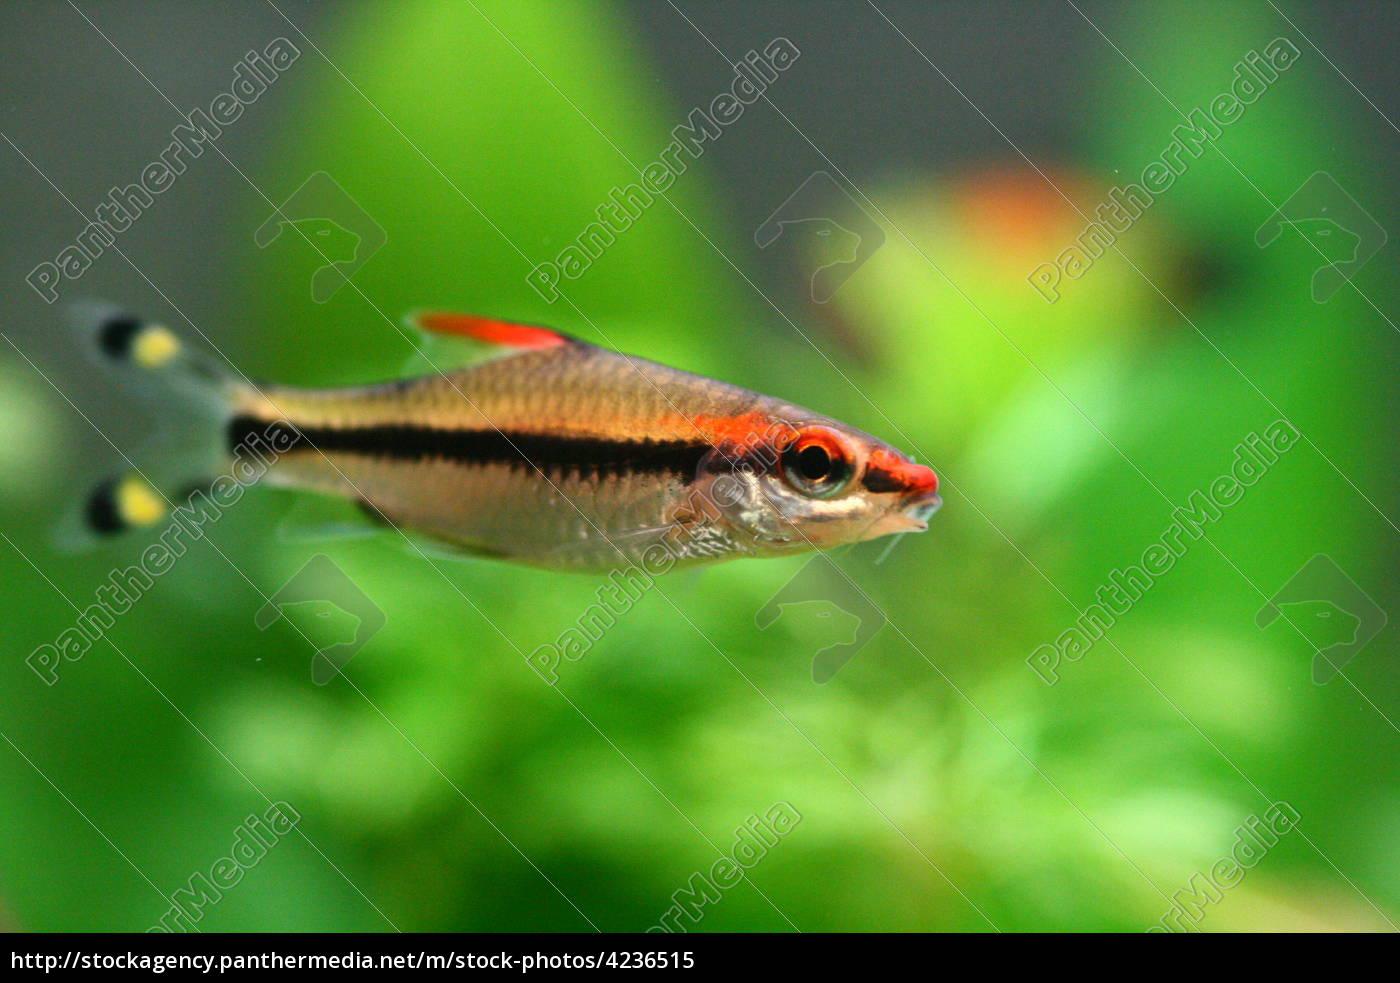 asien fisch asiatisch aquarium torpedo barbe lizenzfreies bild 4236515 bildagentur. Black Bedroom Furniture Sets. Home Design Ideas